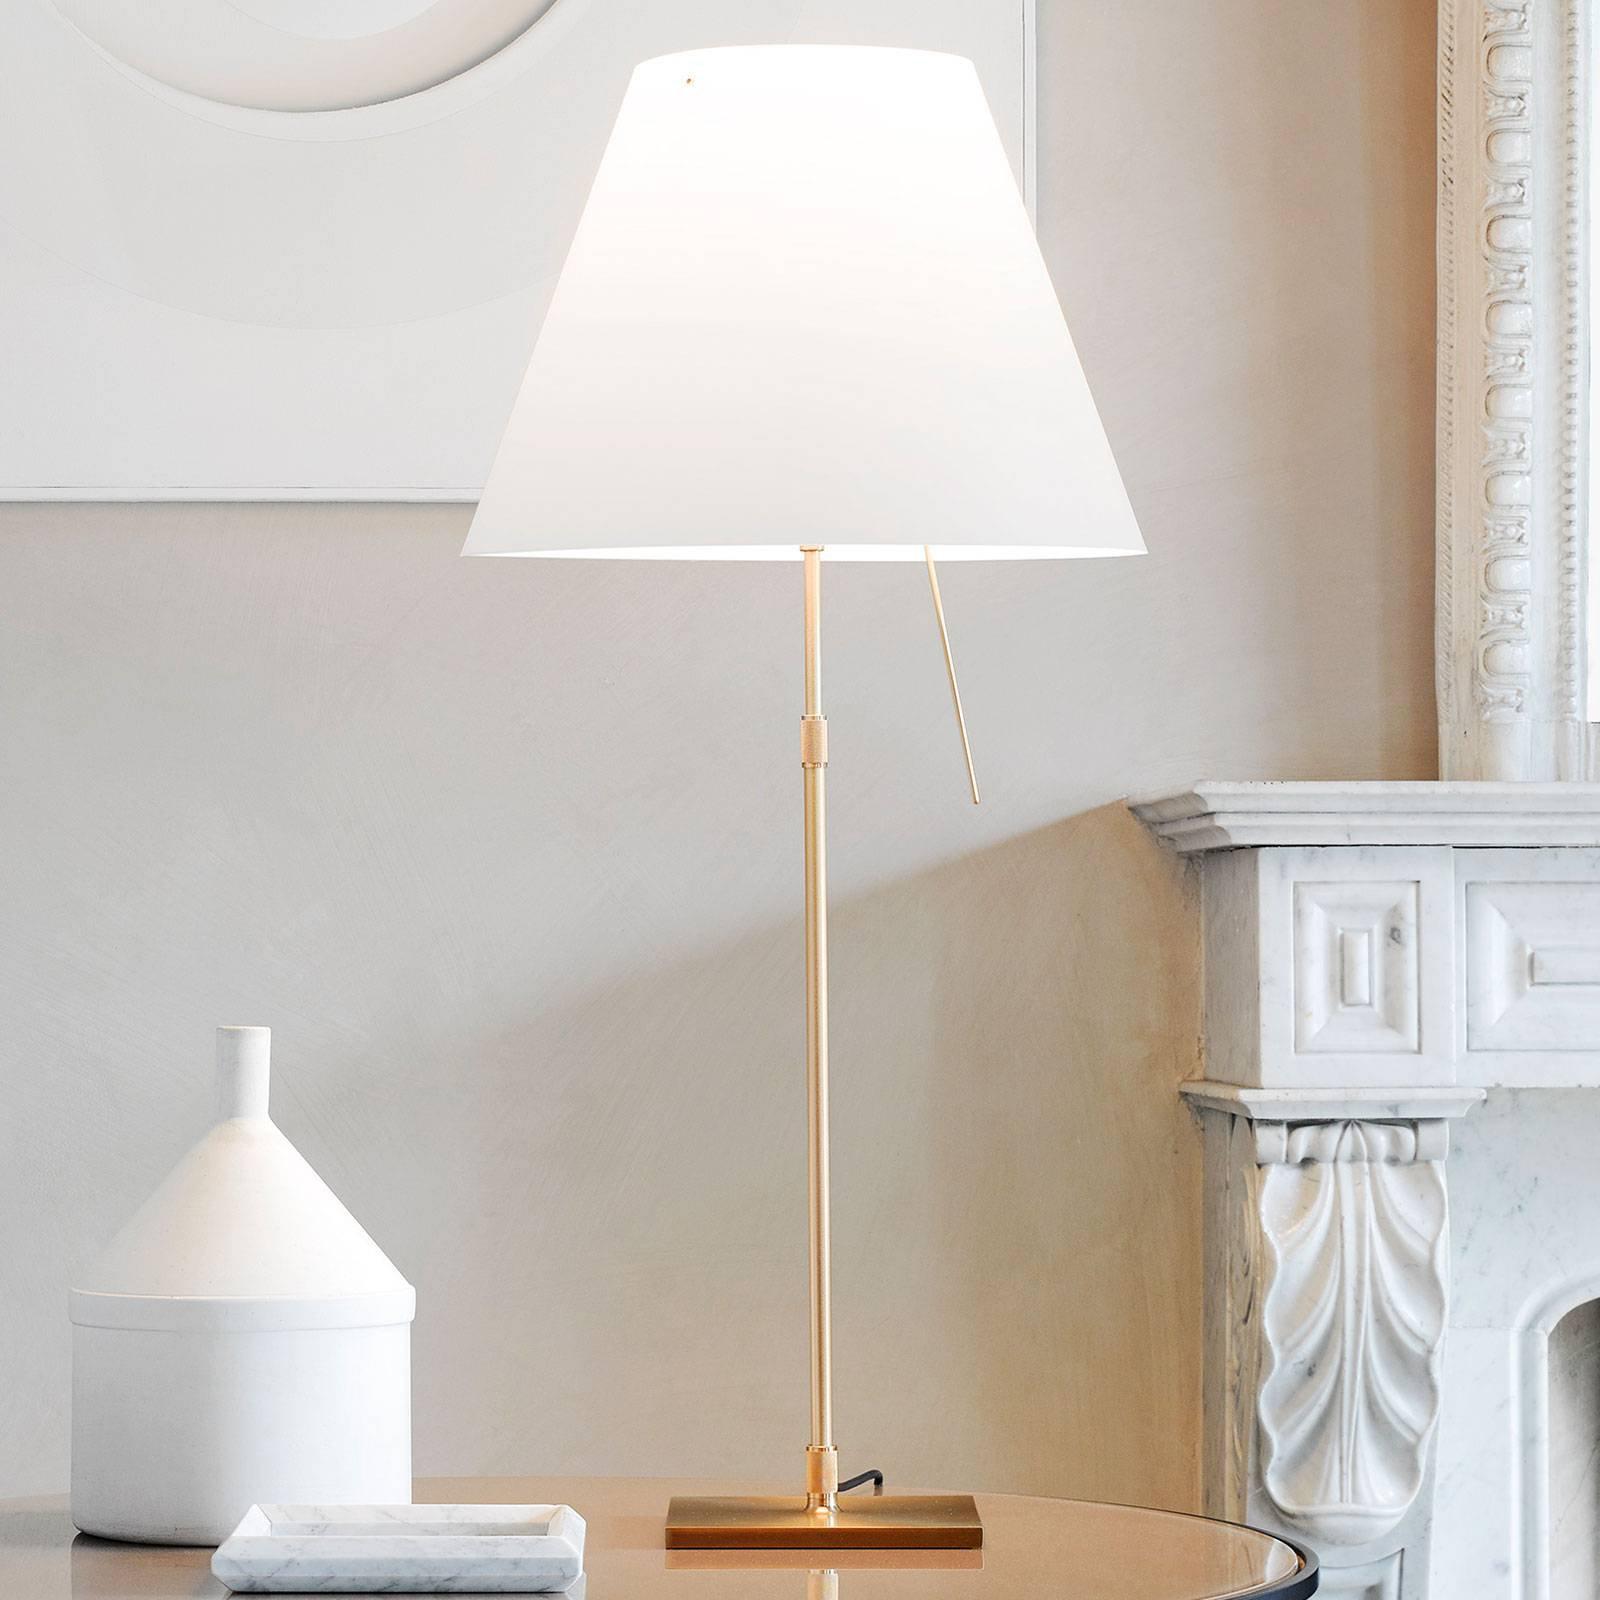 Luceplan Costanza bordlampe D13 messing/hvit